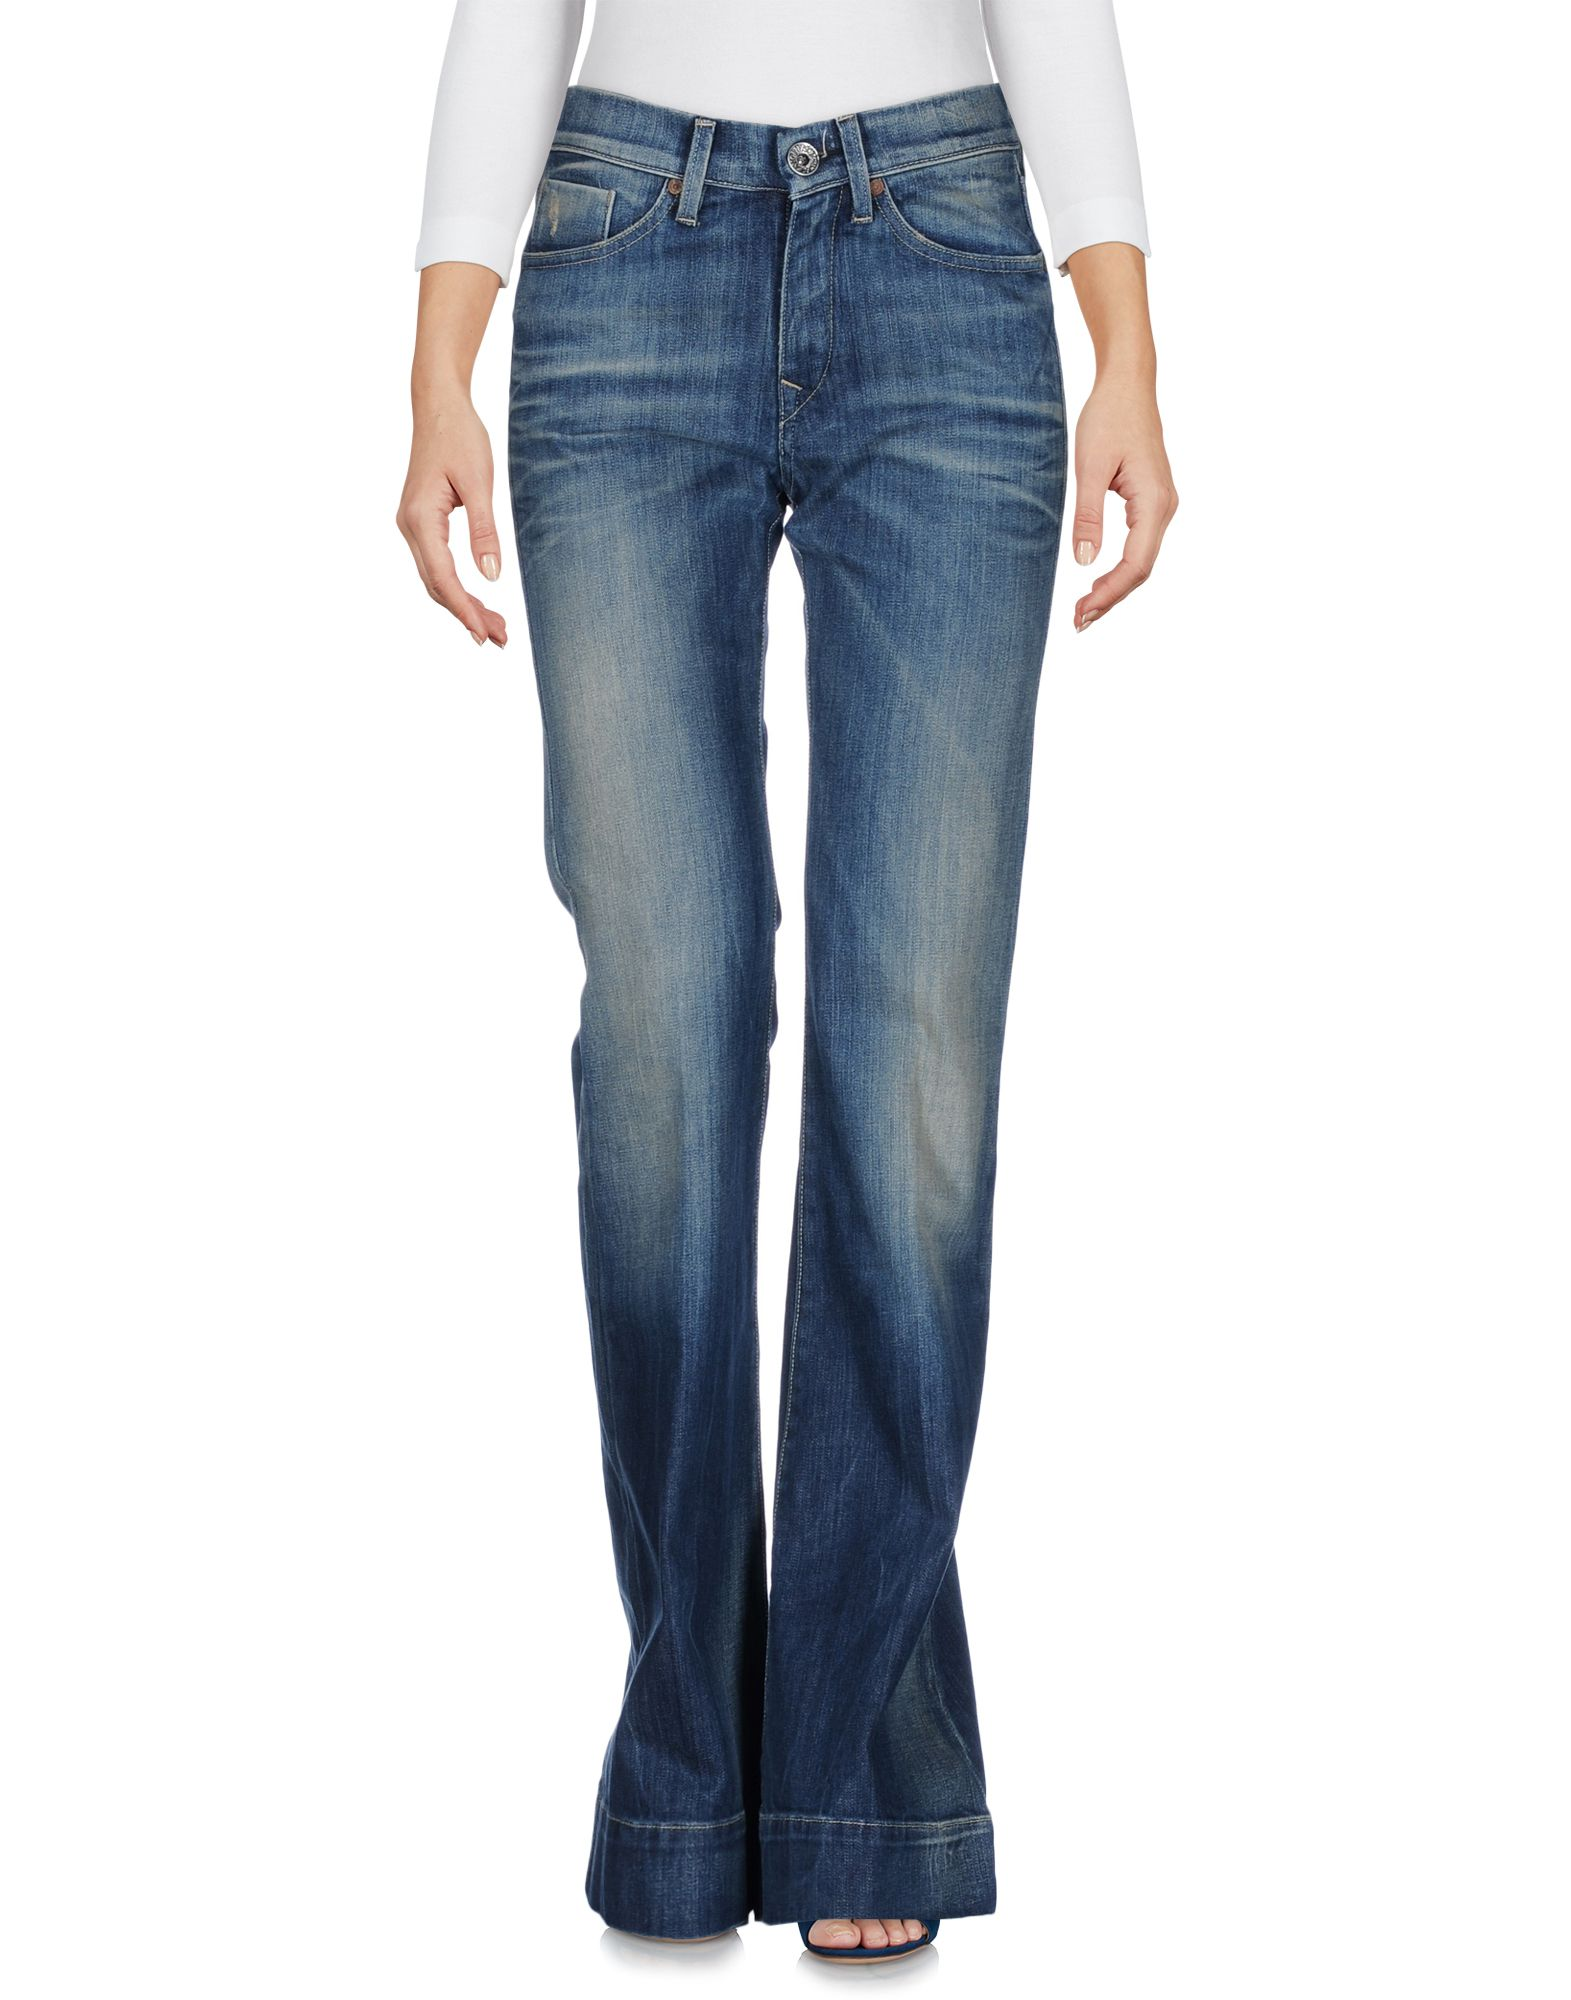 NOLITA DE NIMES Damen Jeanshose Farbe Blau Größe 3 - broschei